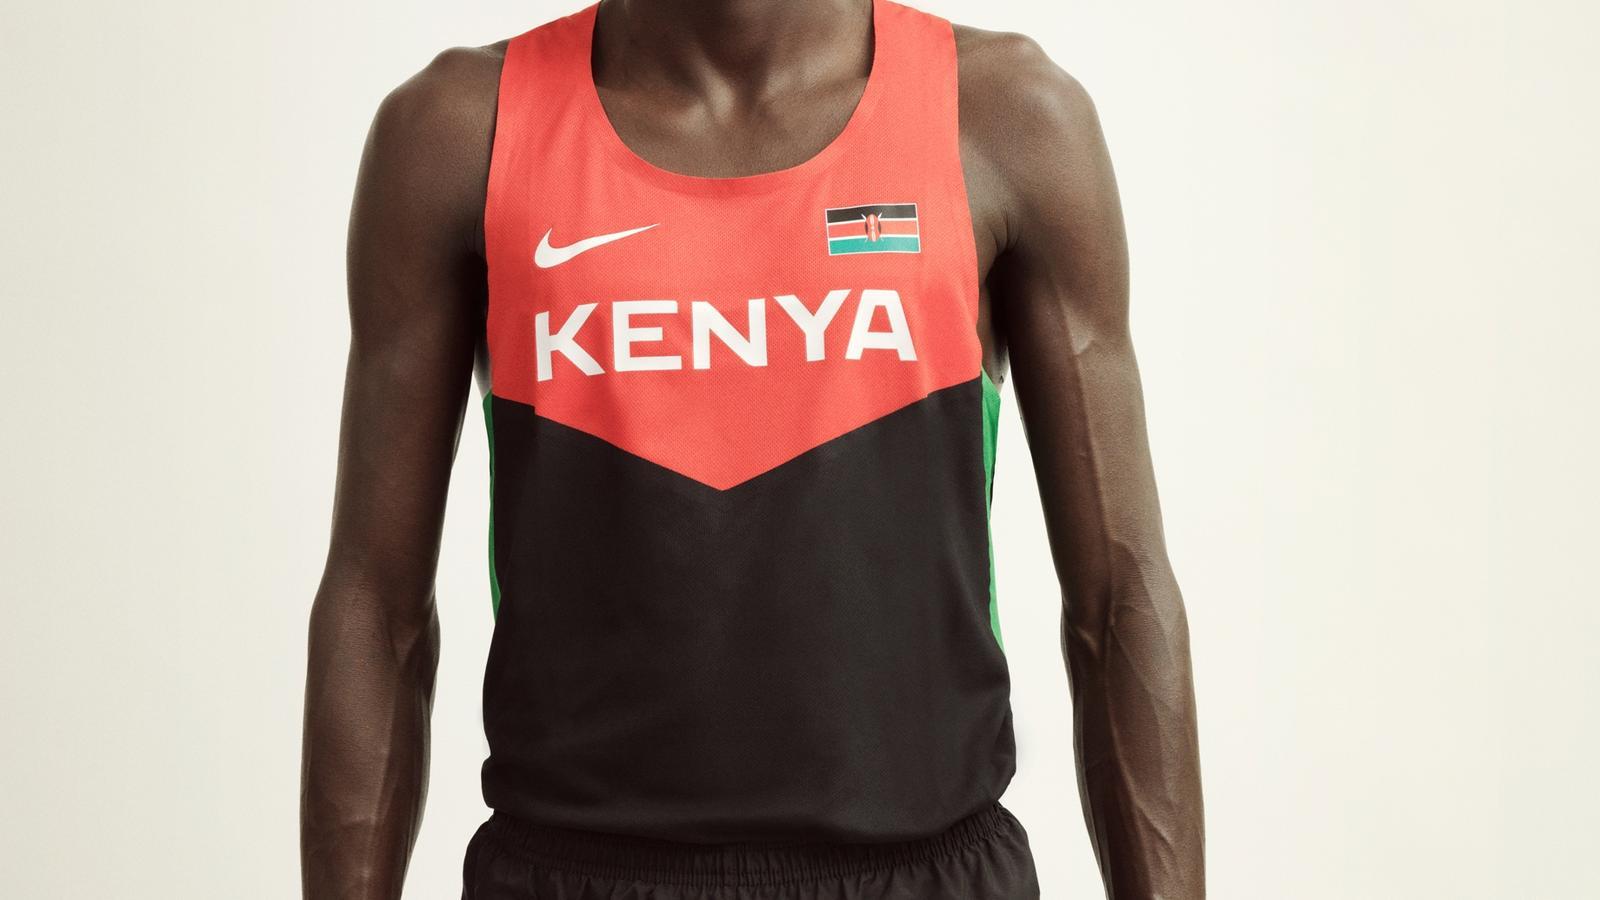 Nike News - Kenyan Marathon Champion to Wear Nike Uniform of Innovative Sustainable Materials